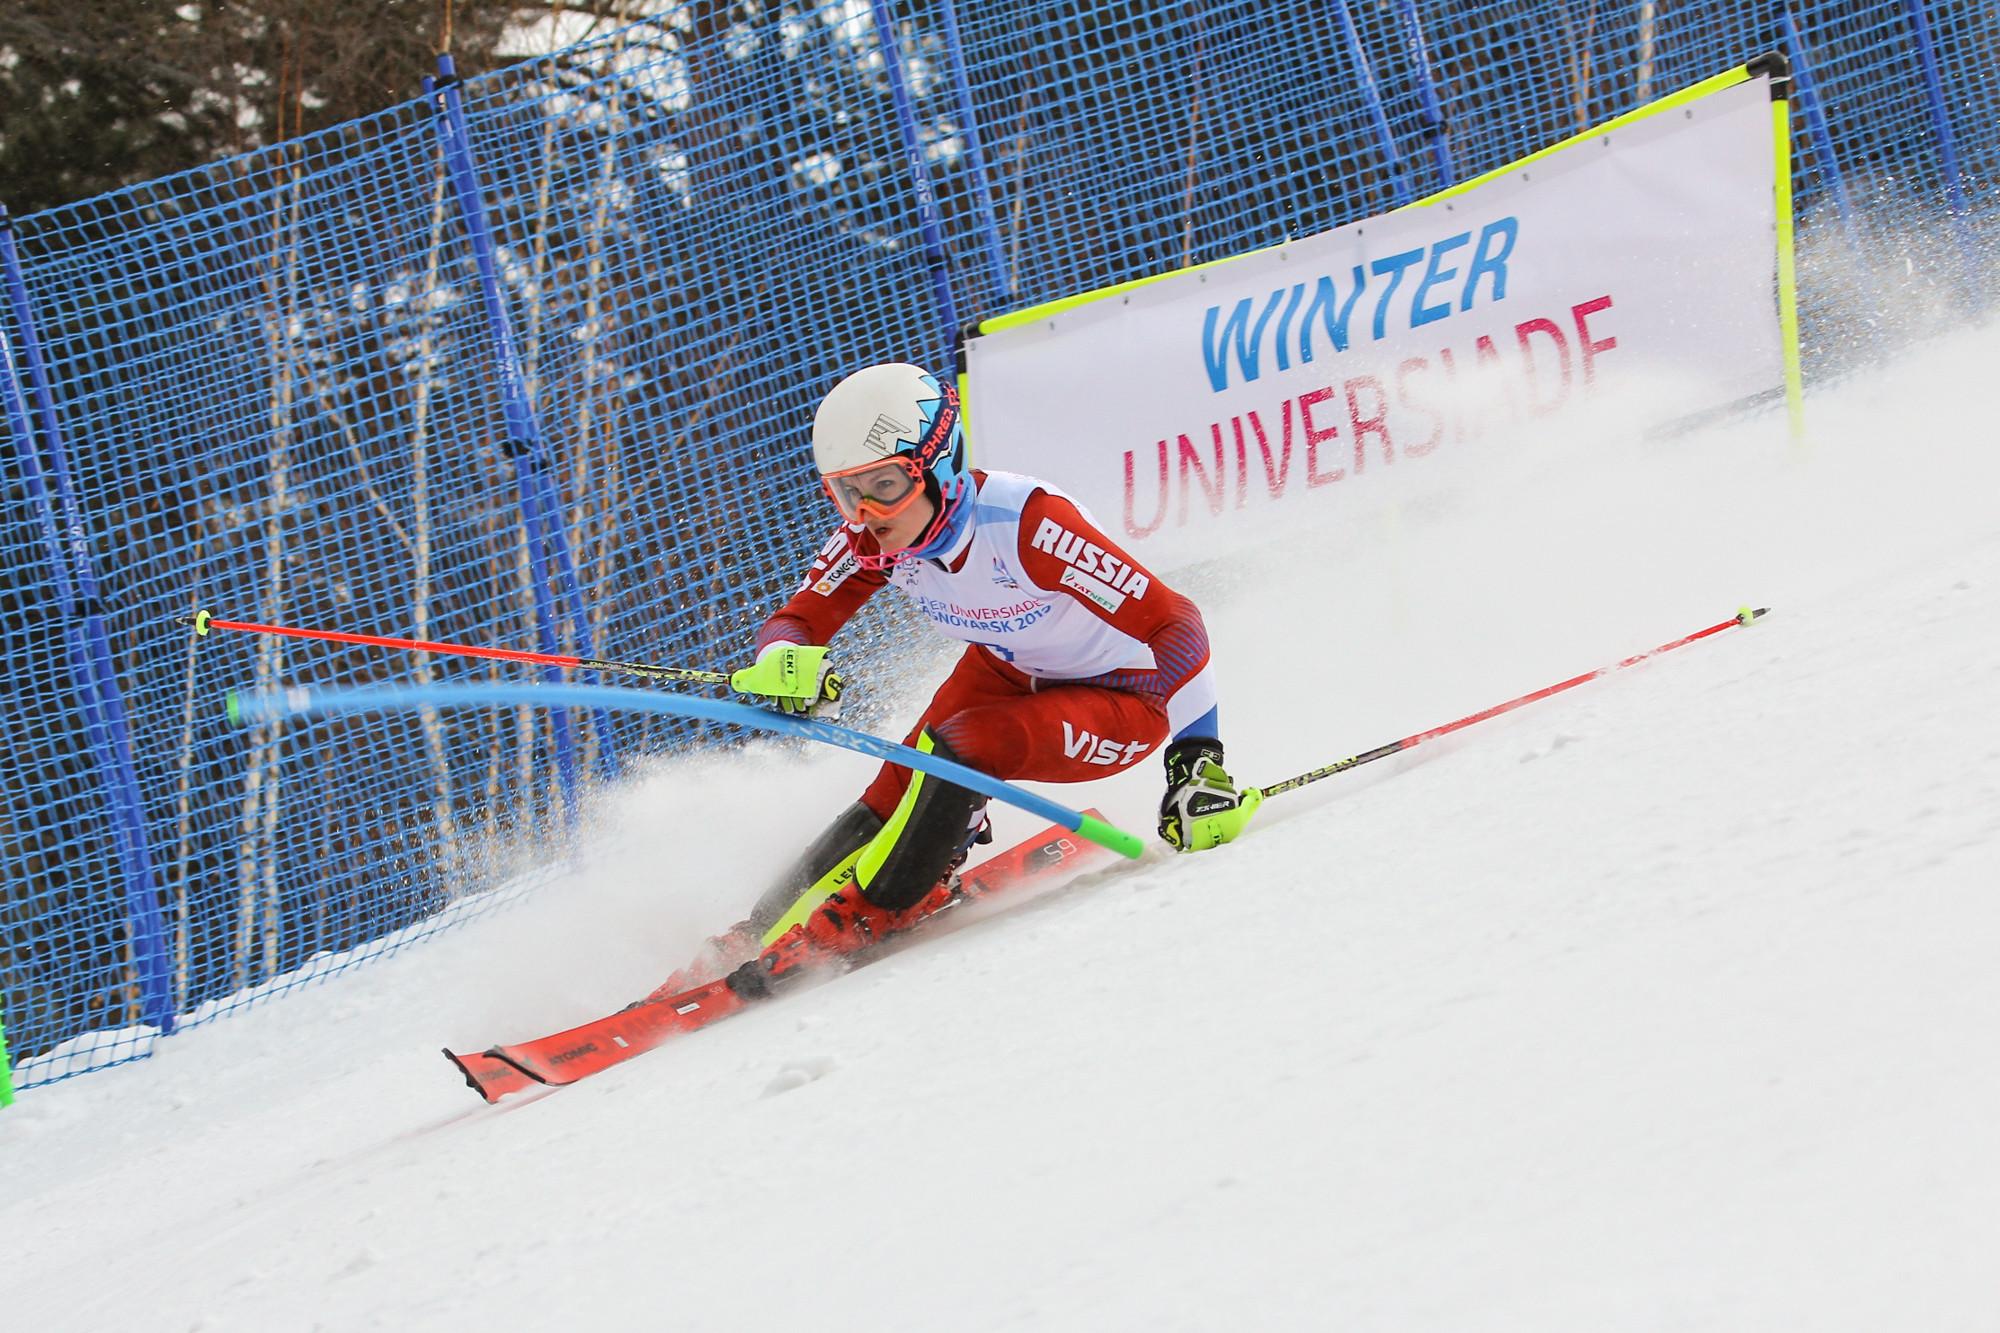 The women's Alpine skiing slalom event also got underway at the Sopka Cluster ©Krasnoyarsk 2019